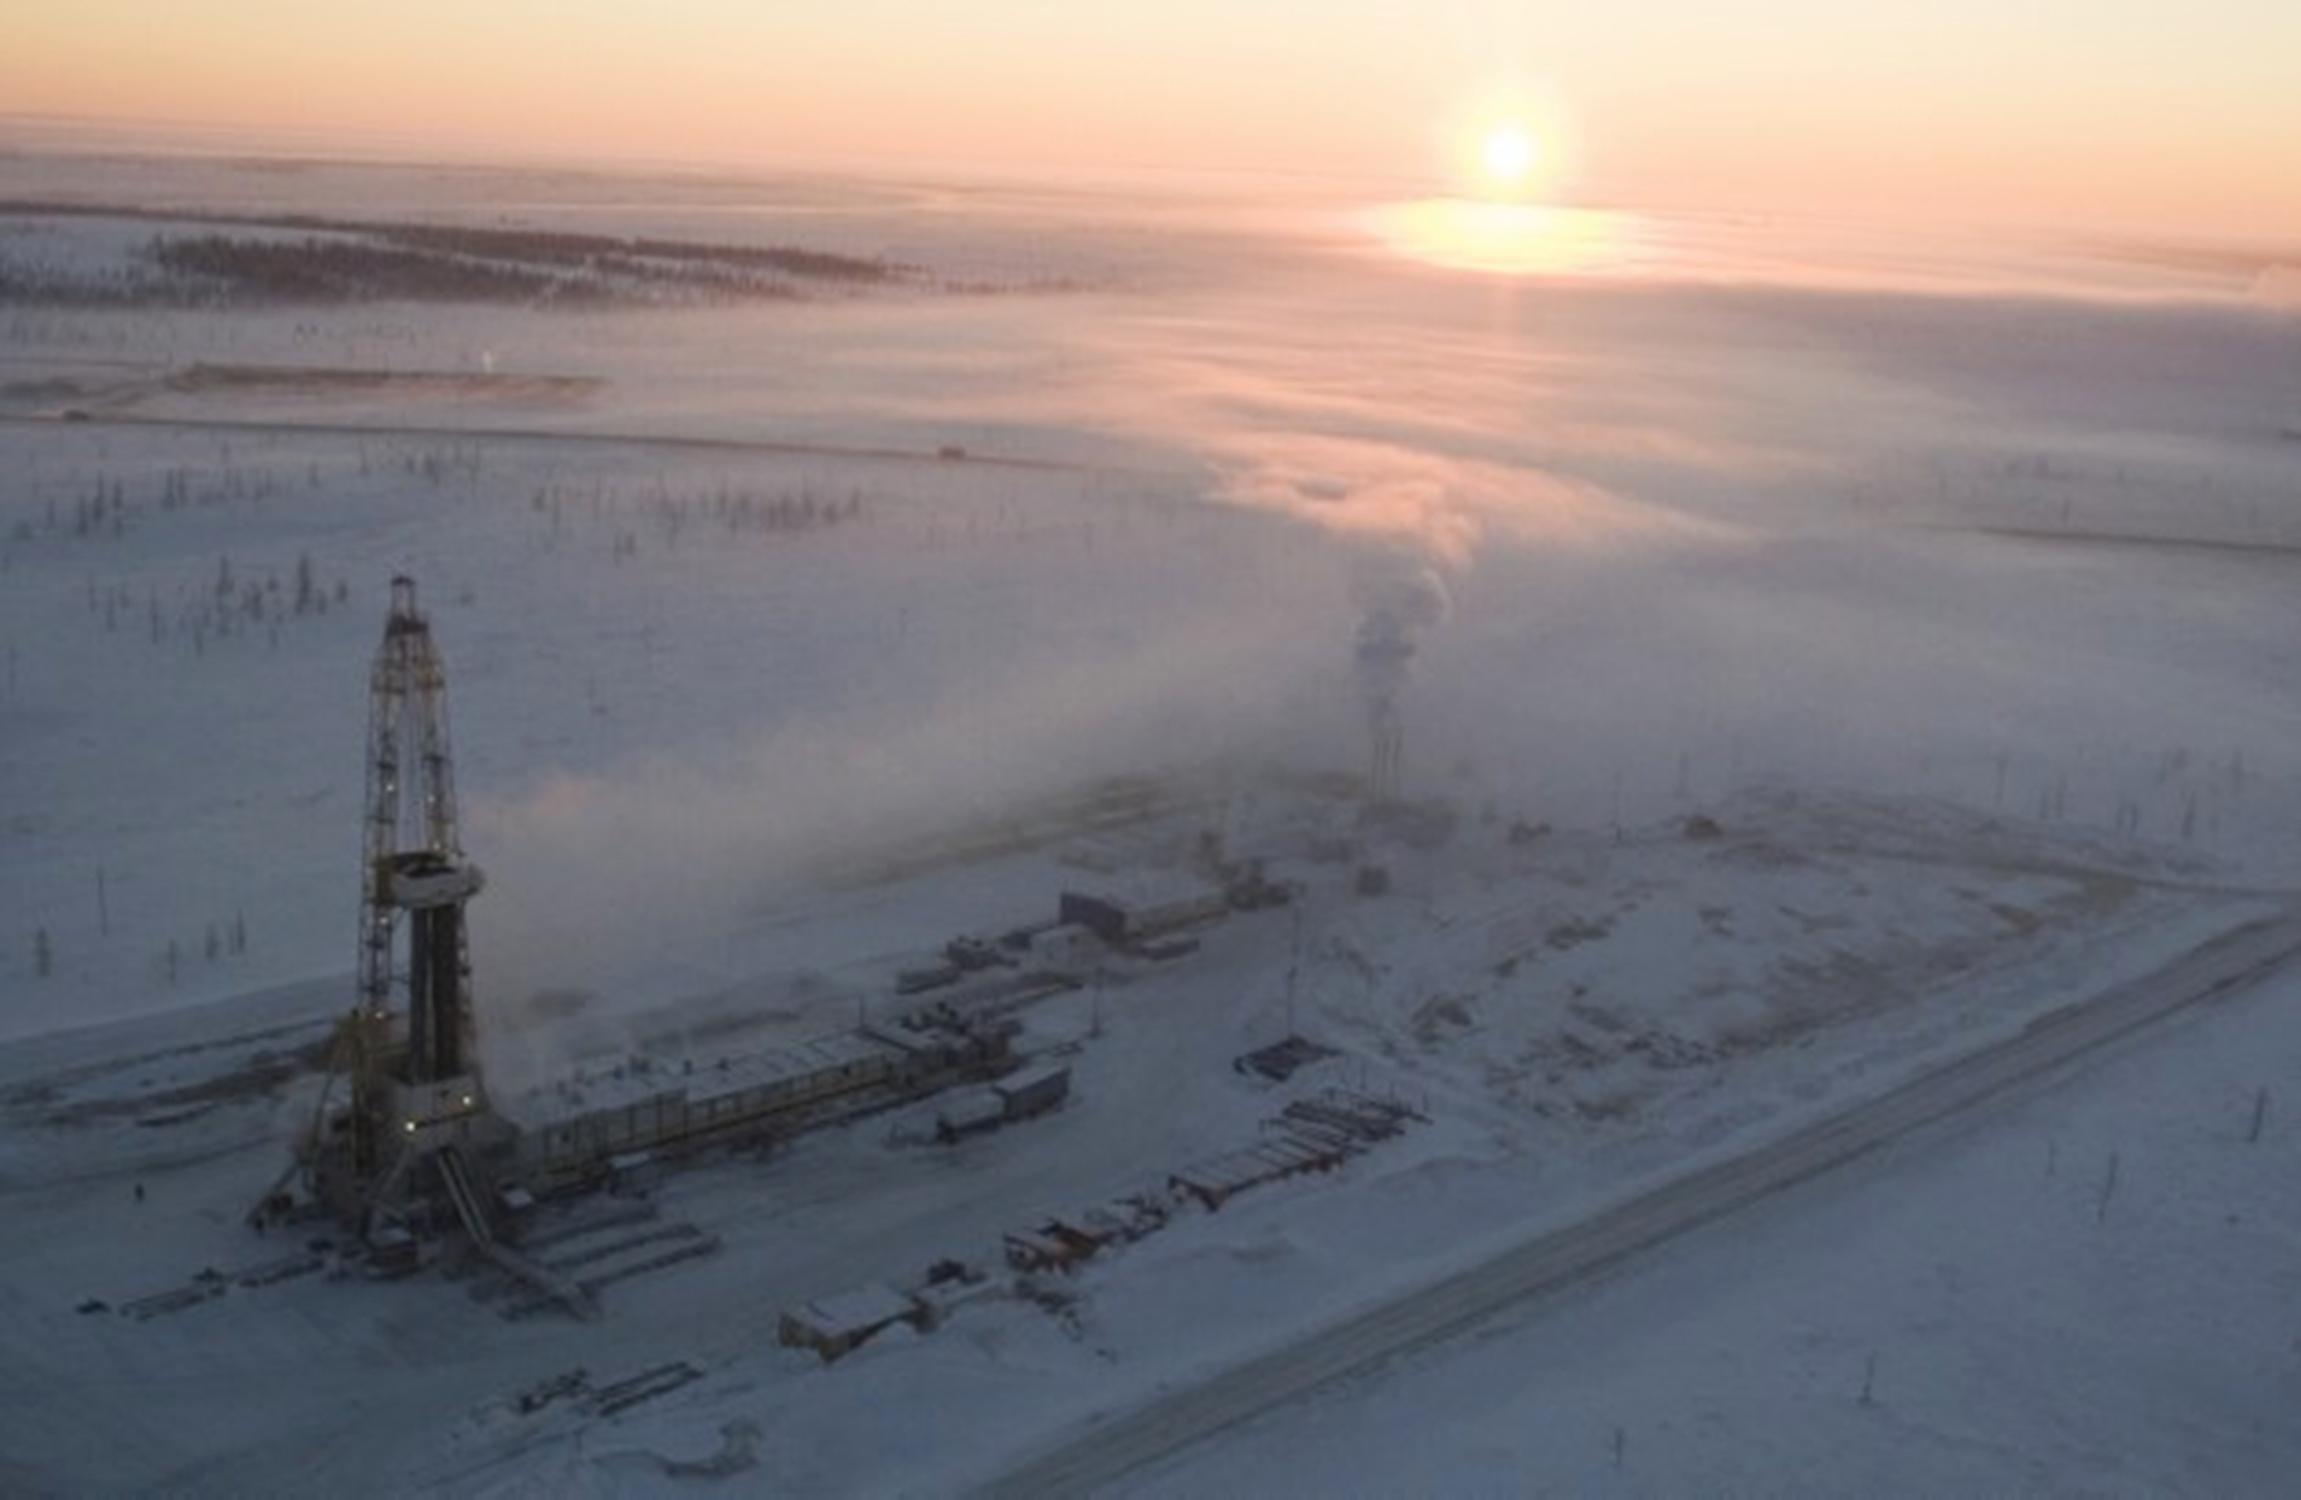 WEG384_Vankorneft_Eastern_Siberia_pic1.jpg